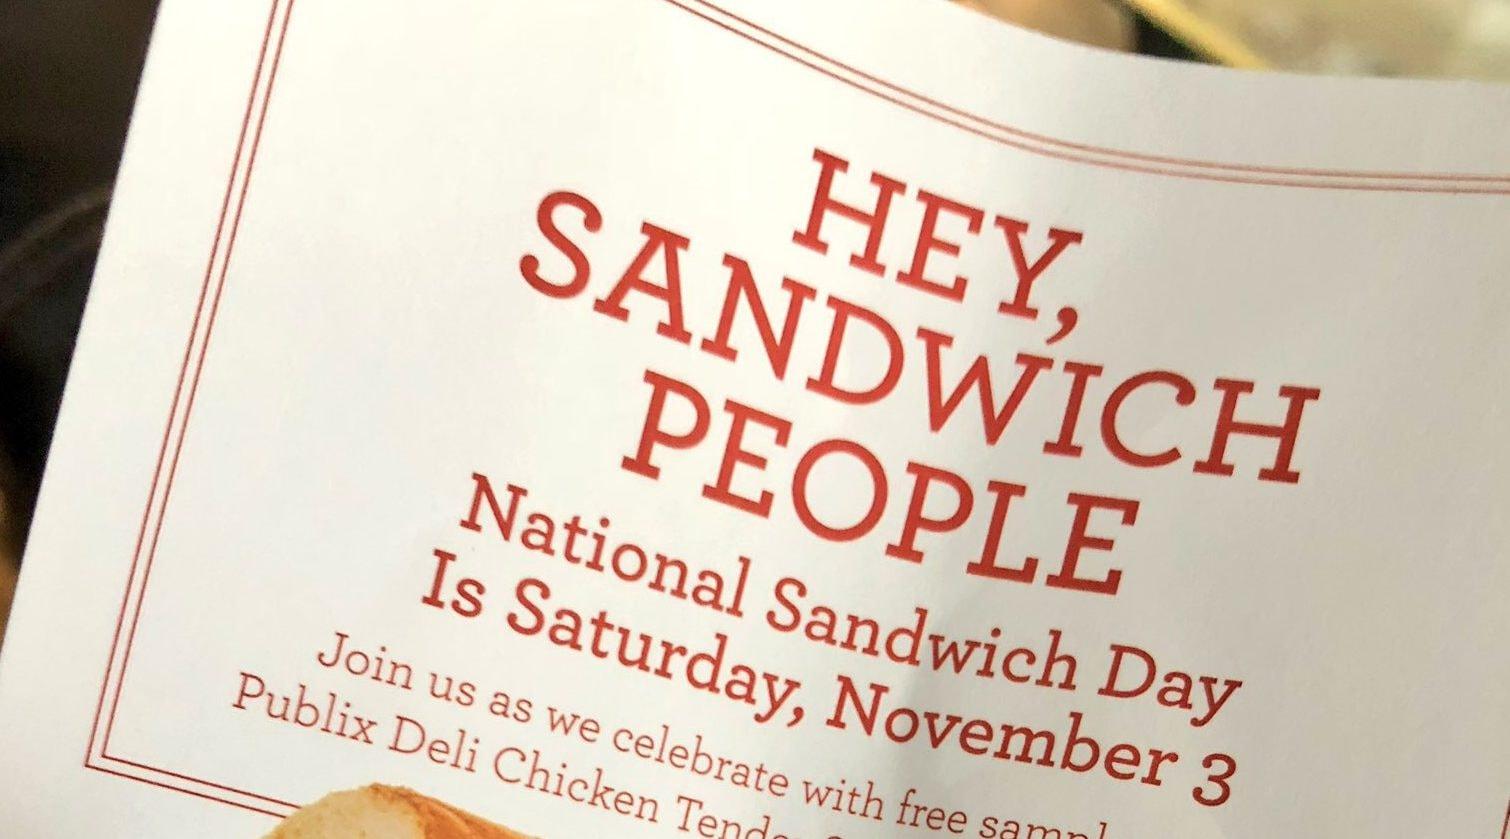 3 Tampa Bay Sandwich Day Deals